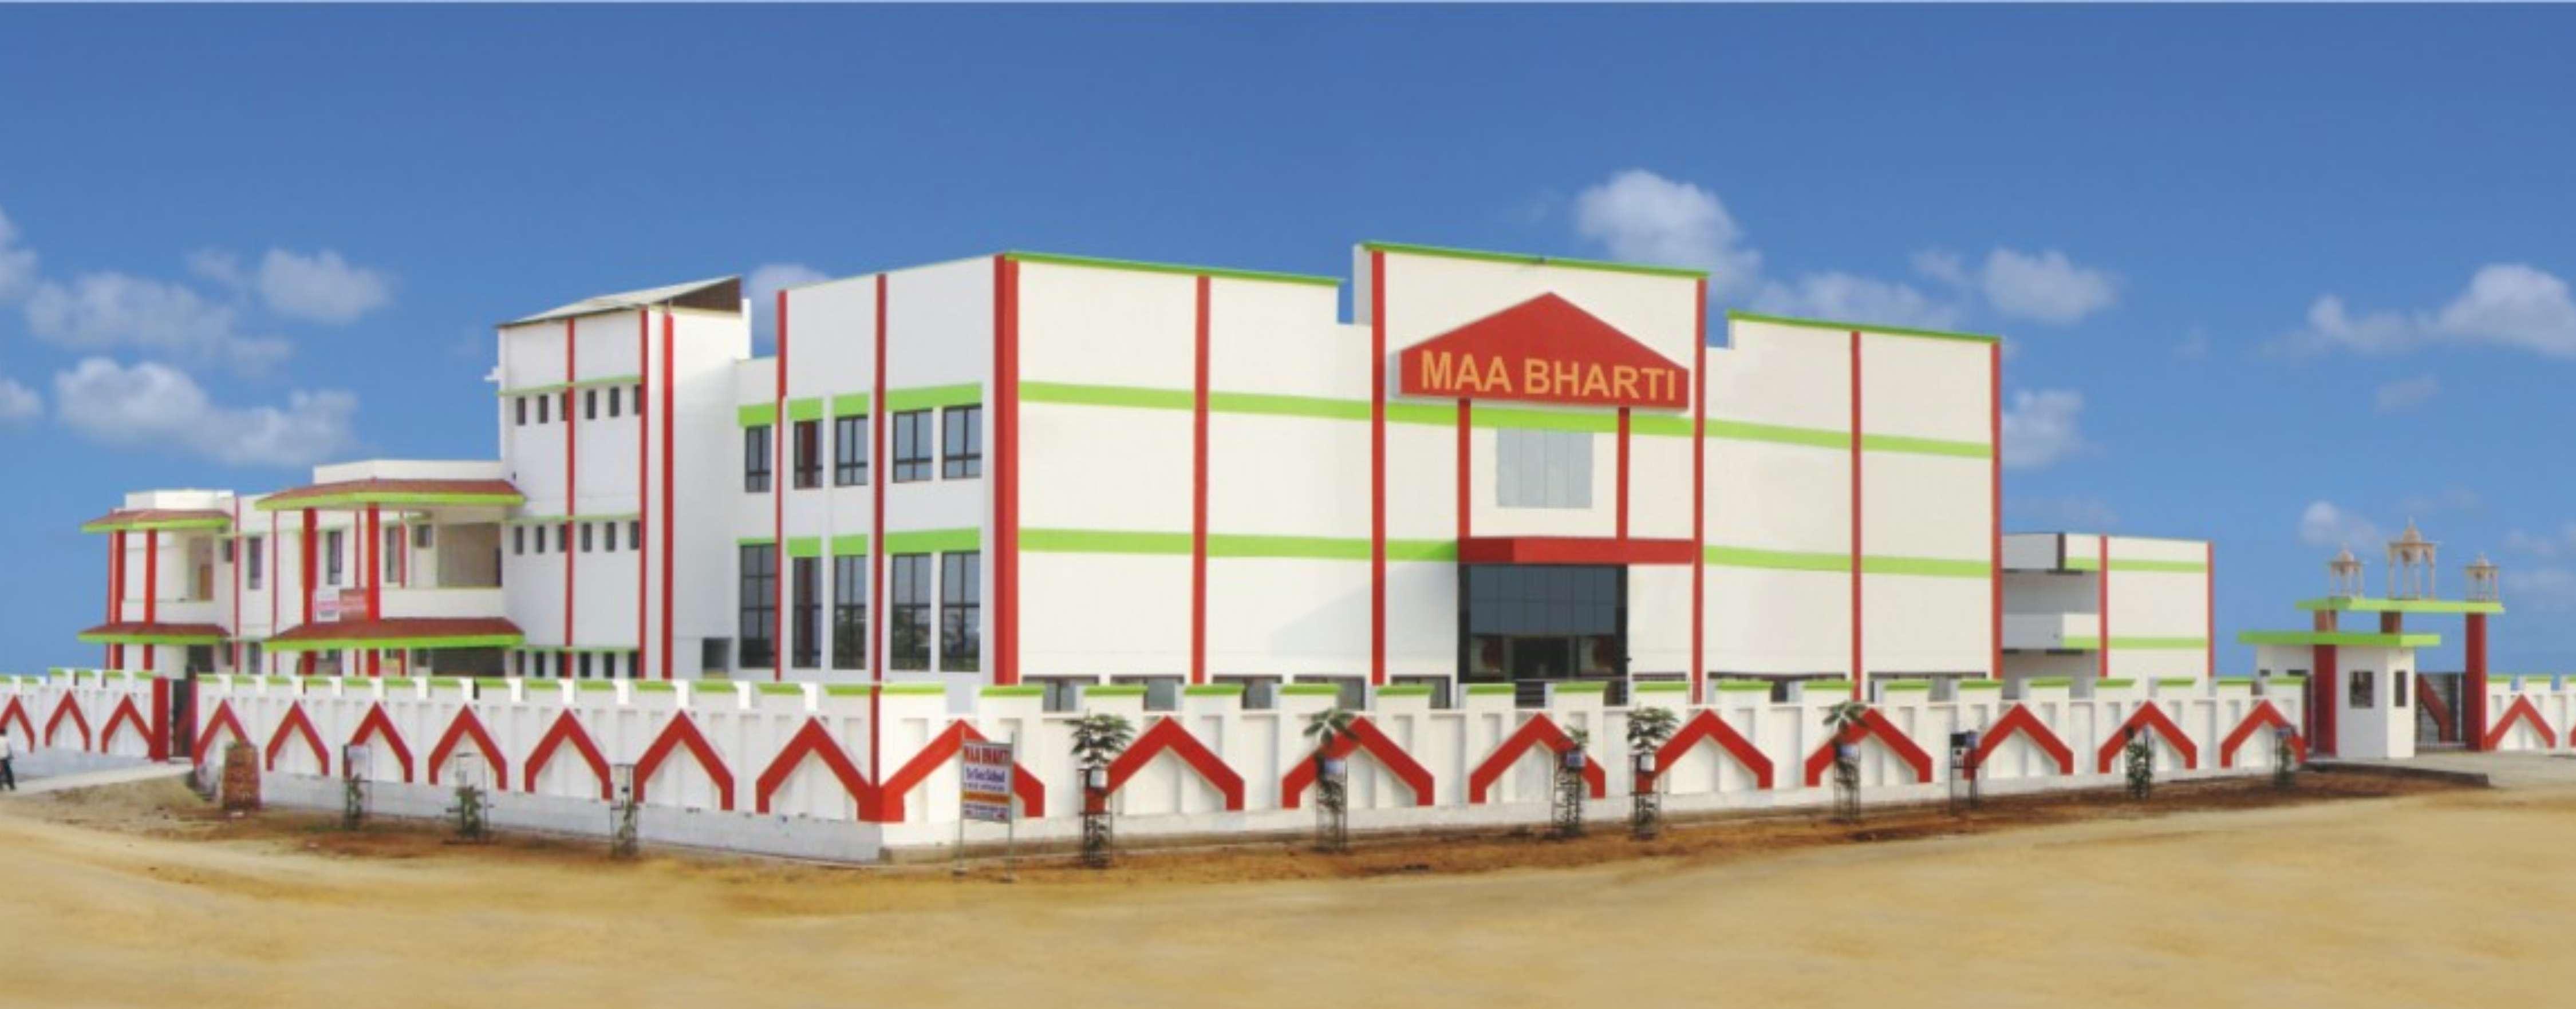 MAA BHARATI SENIOR SECONDARY SCHOOL 4-C-16, TALWANDI, KOTA - The